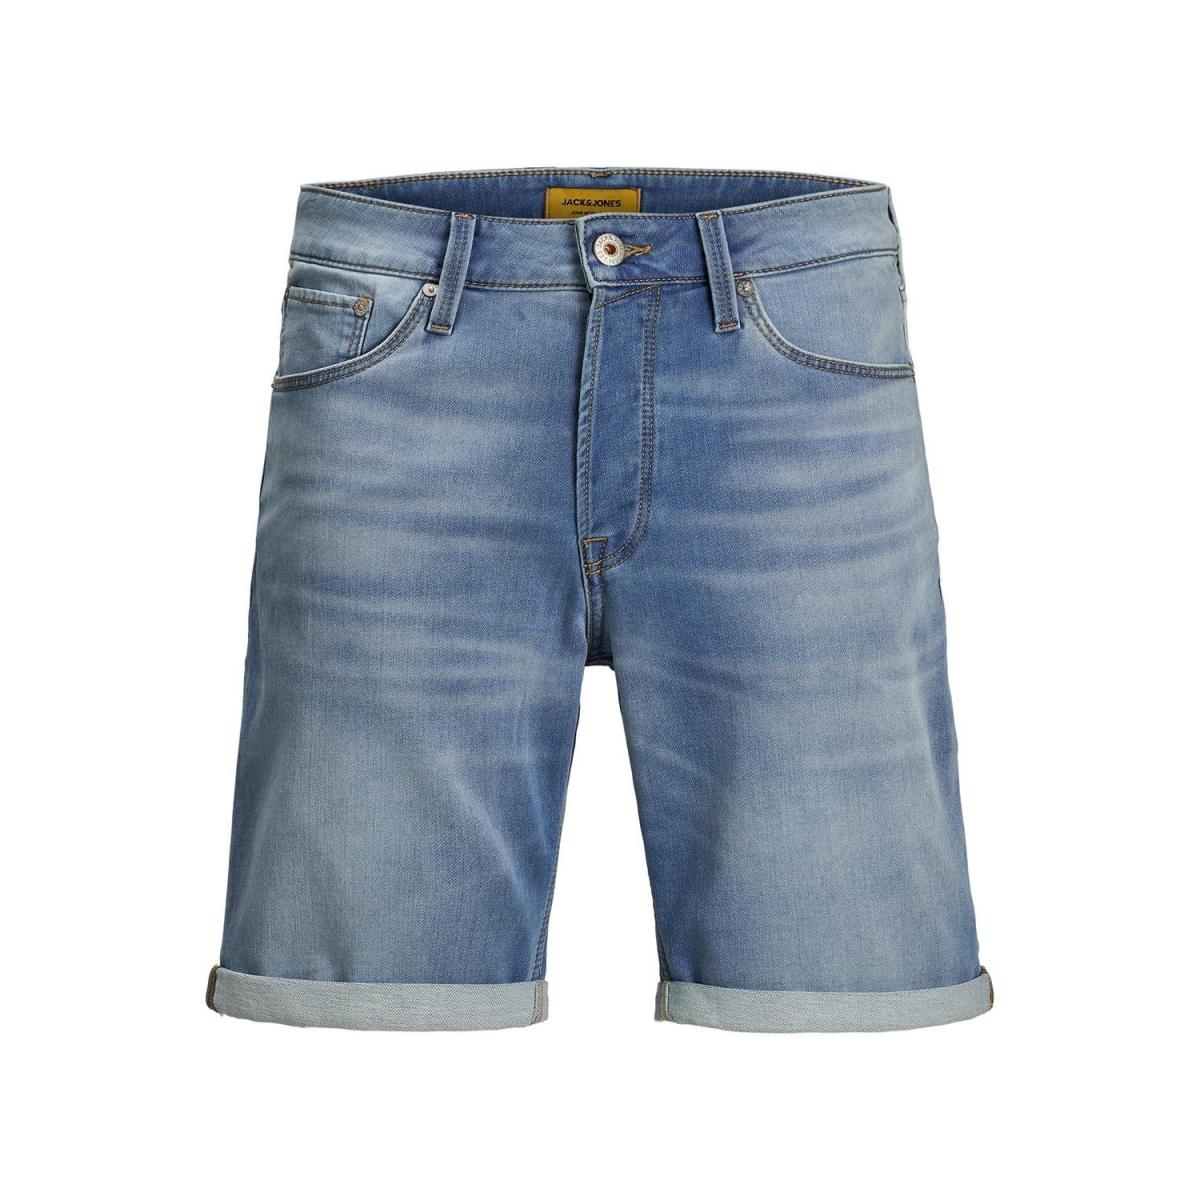 jjirick jjicon shorts ge 003 i.k st 12166263 jack & jones korte broek blue denim